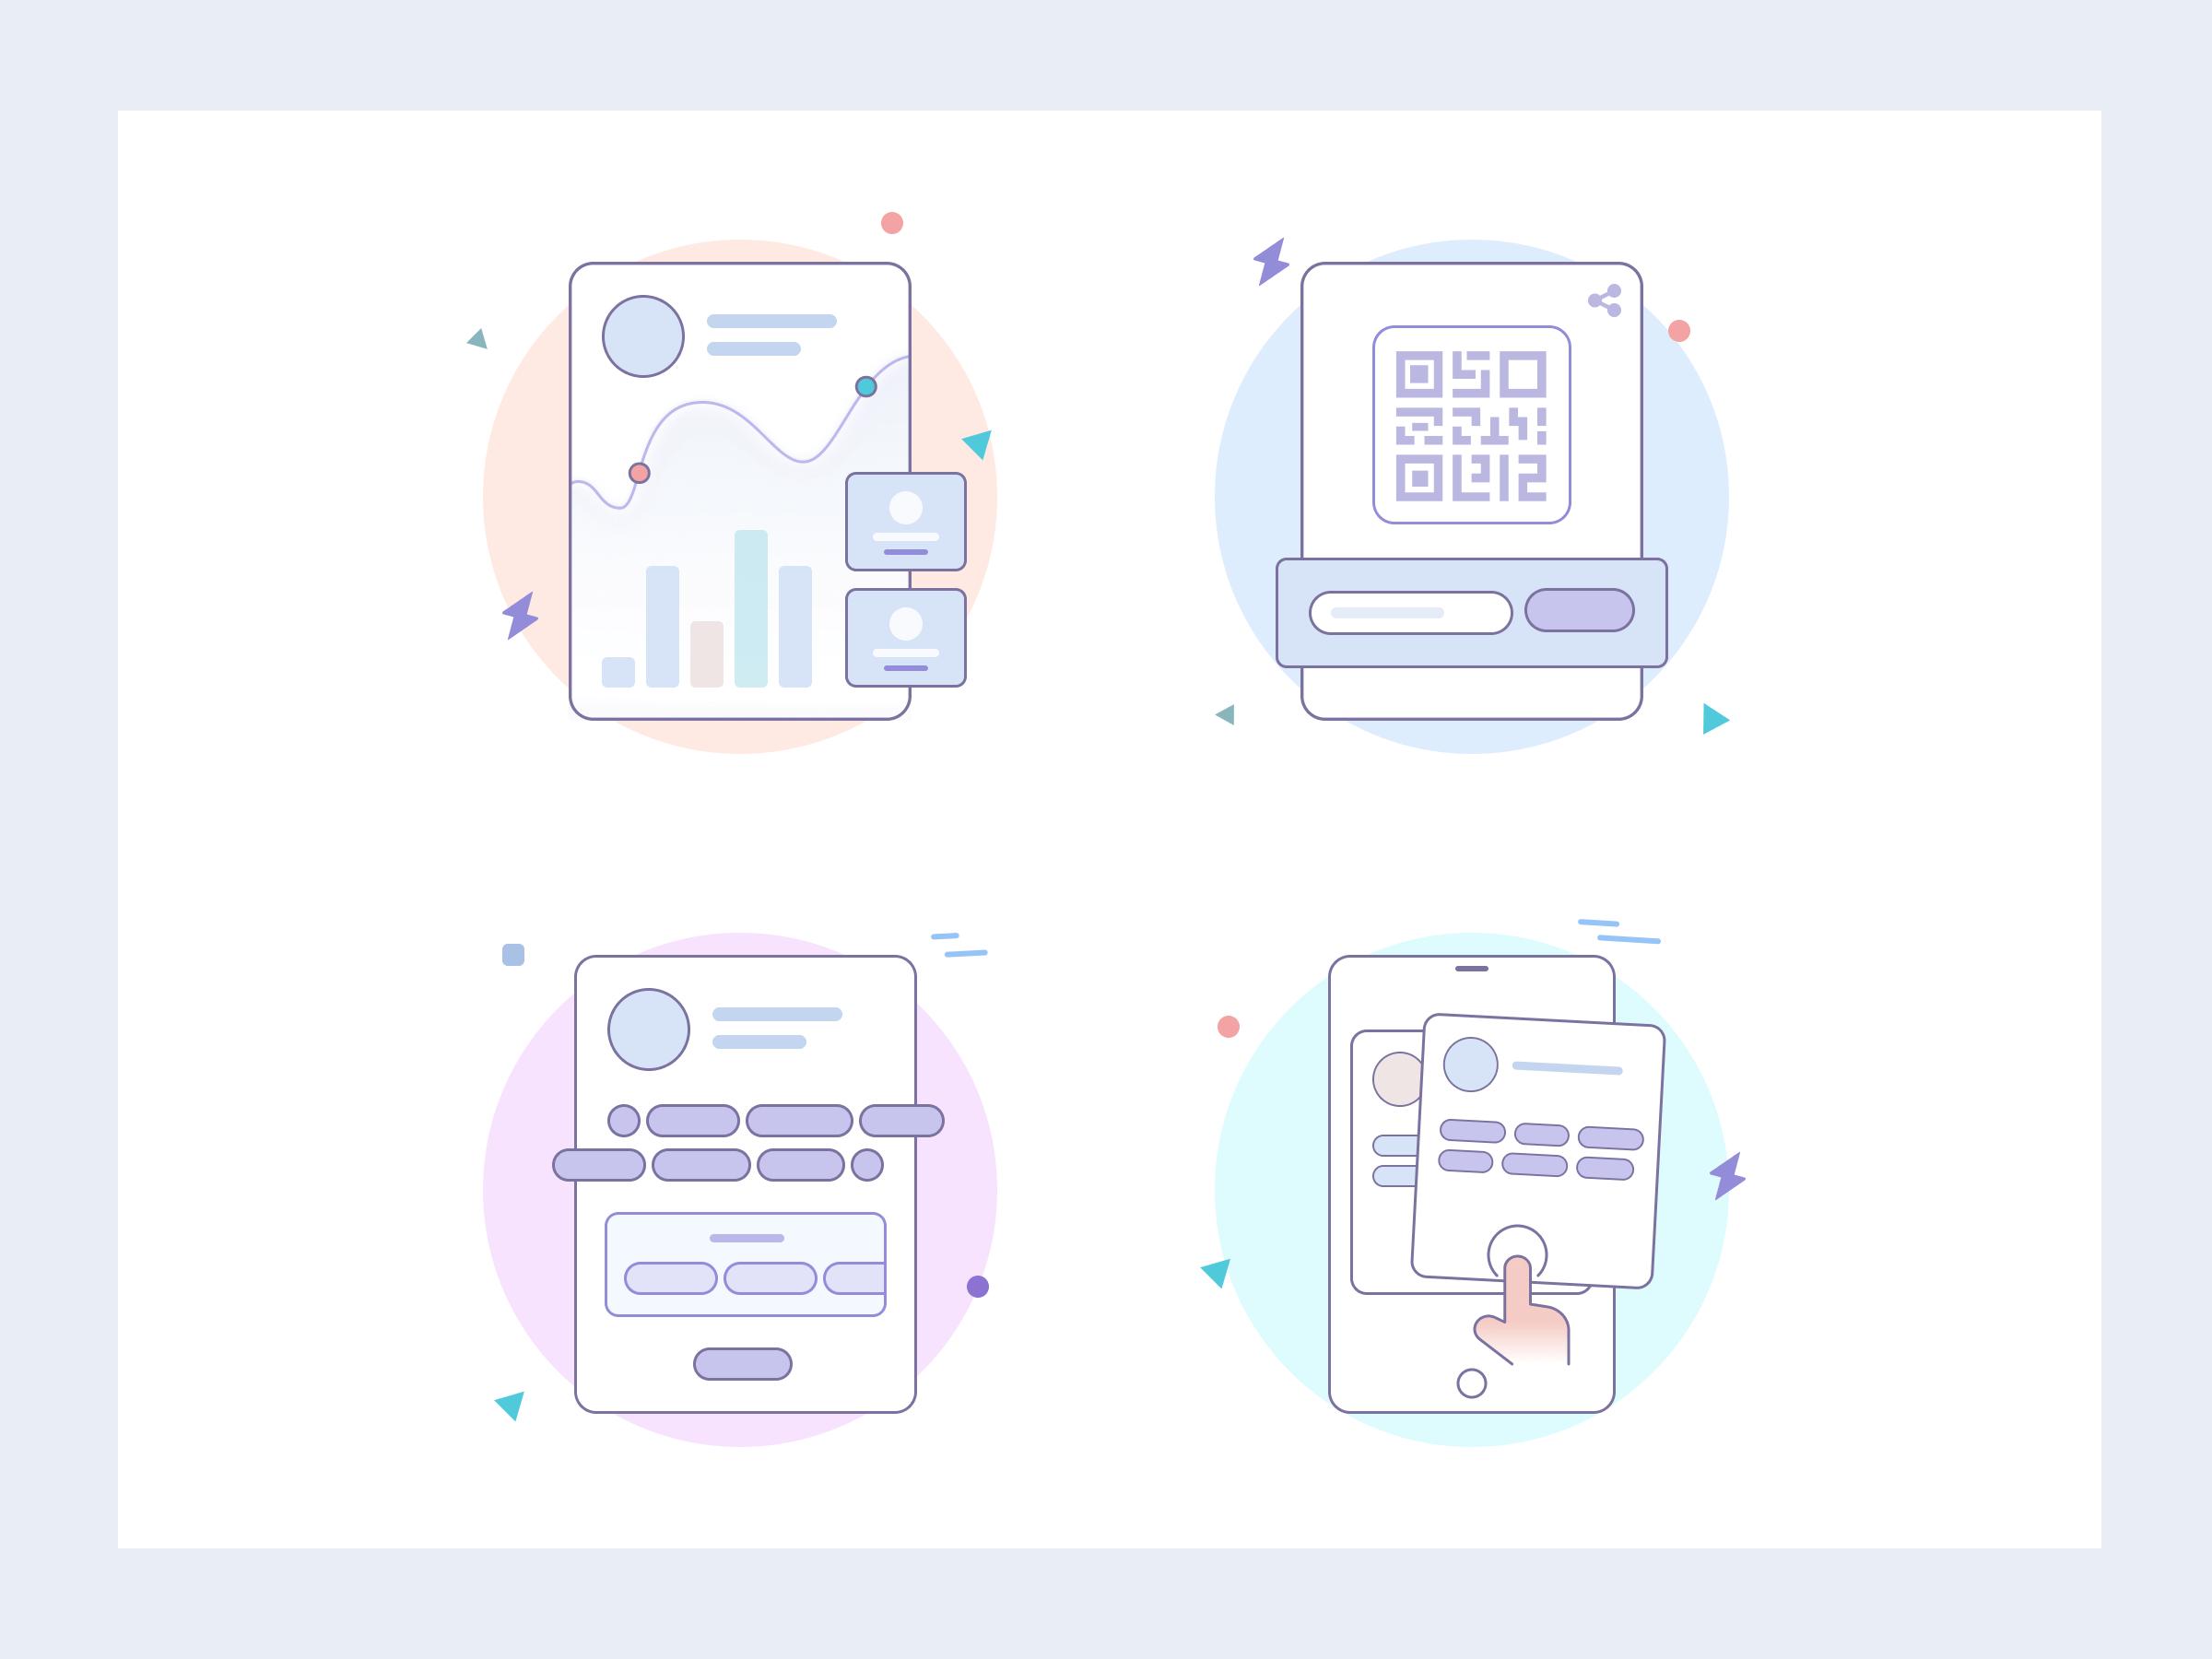 LetsChatWith illustrations set